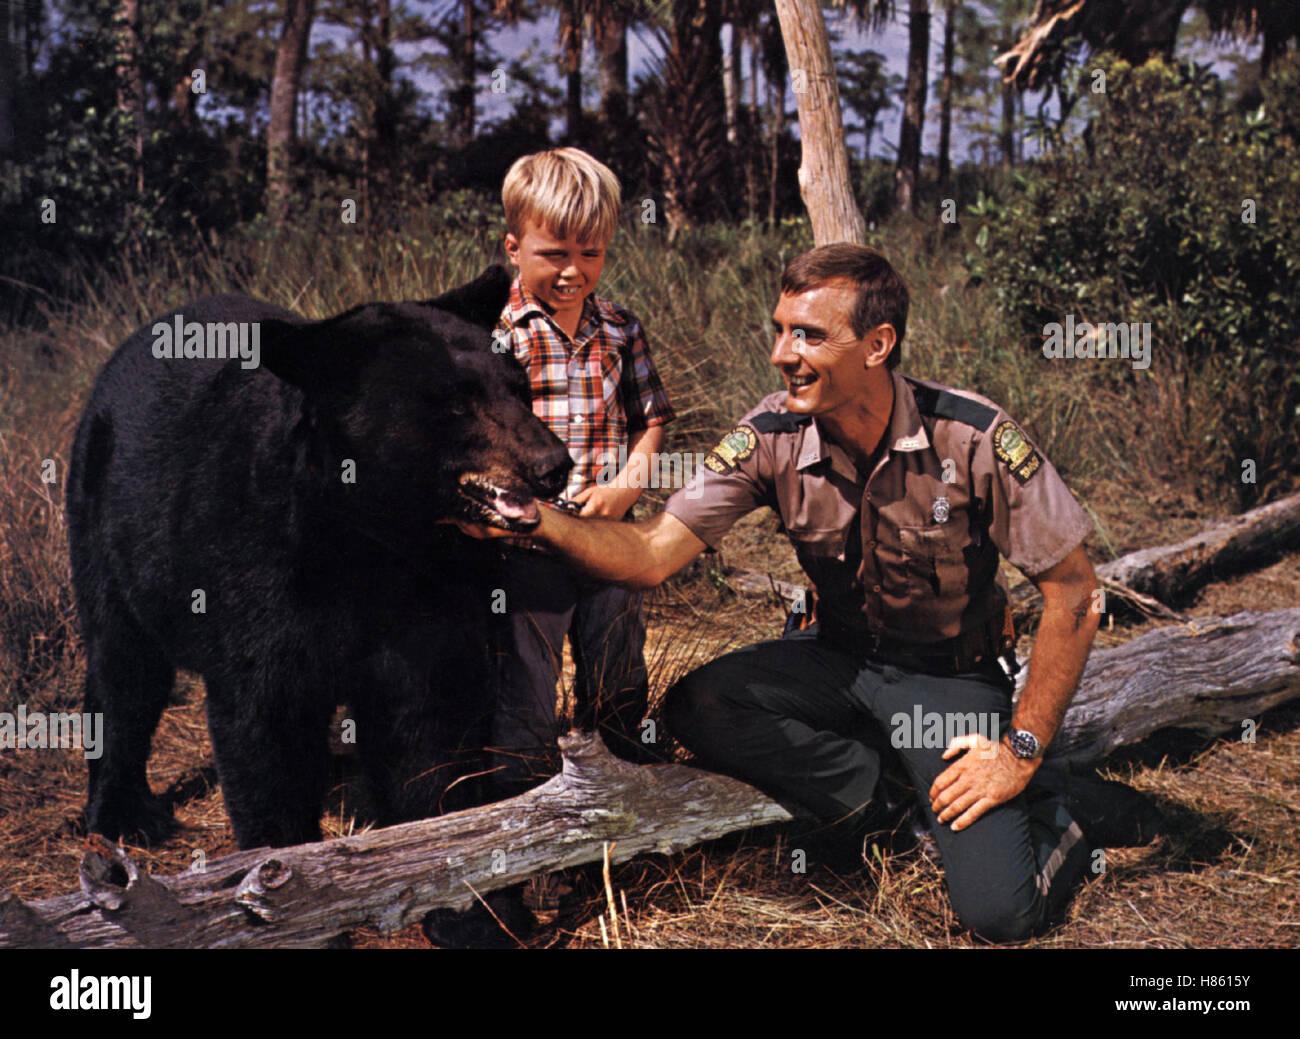 Der sanfte Ben, (GENTLE GIANT) USA 1967, Regie: James Neilson, Bär 'Ben', CLINT HOWARD, DENNIS WEAVER, - Stock Image